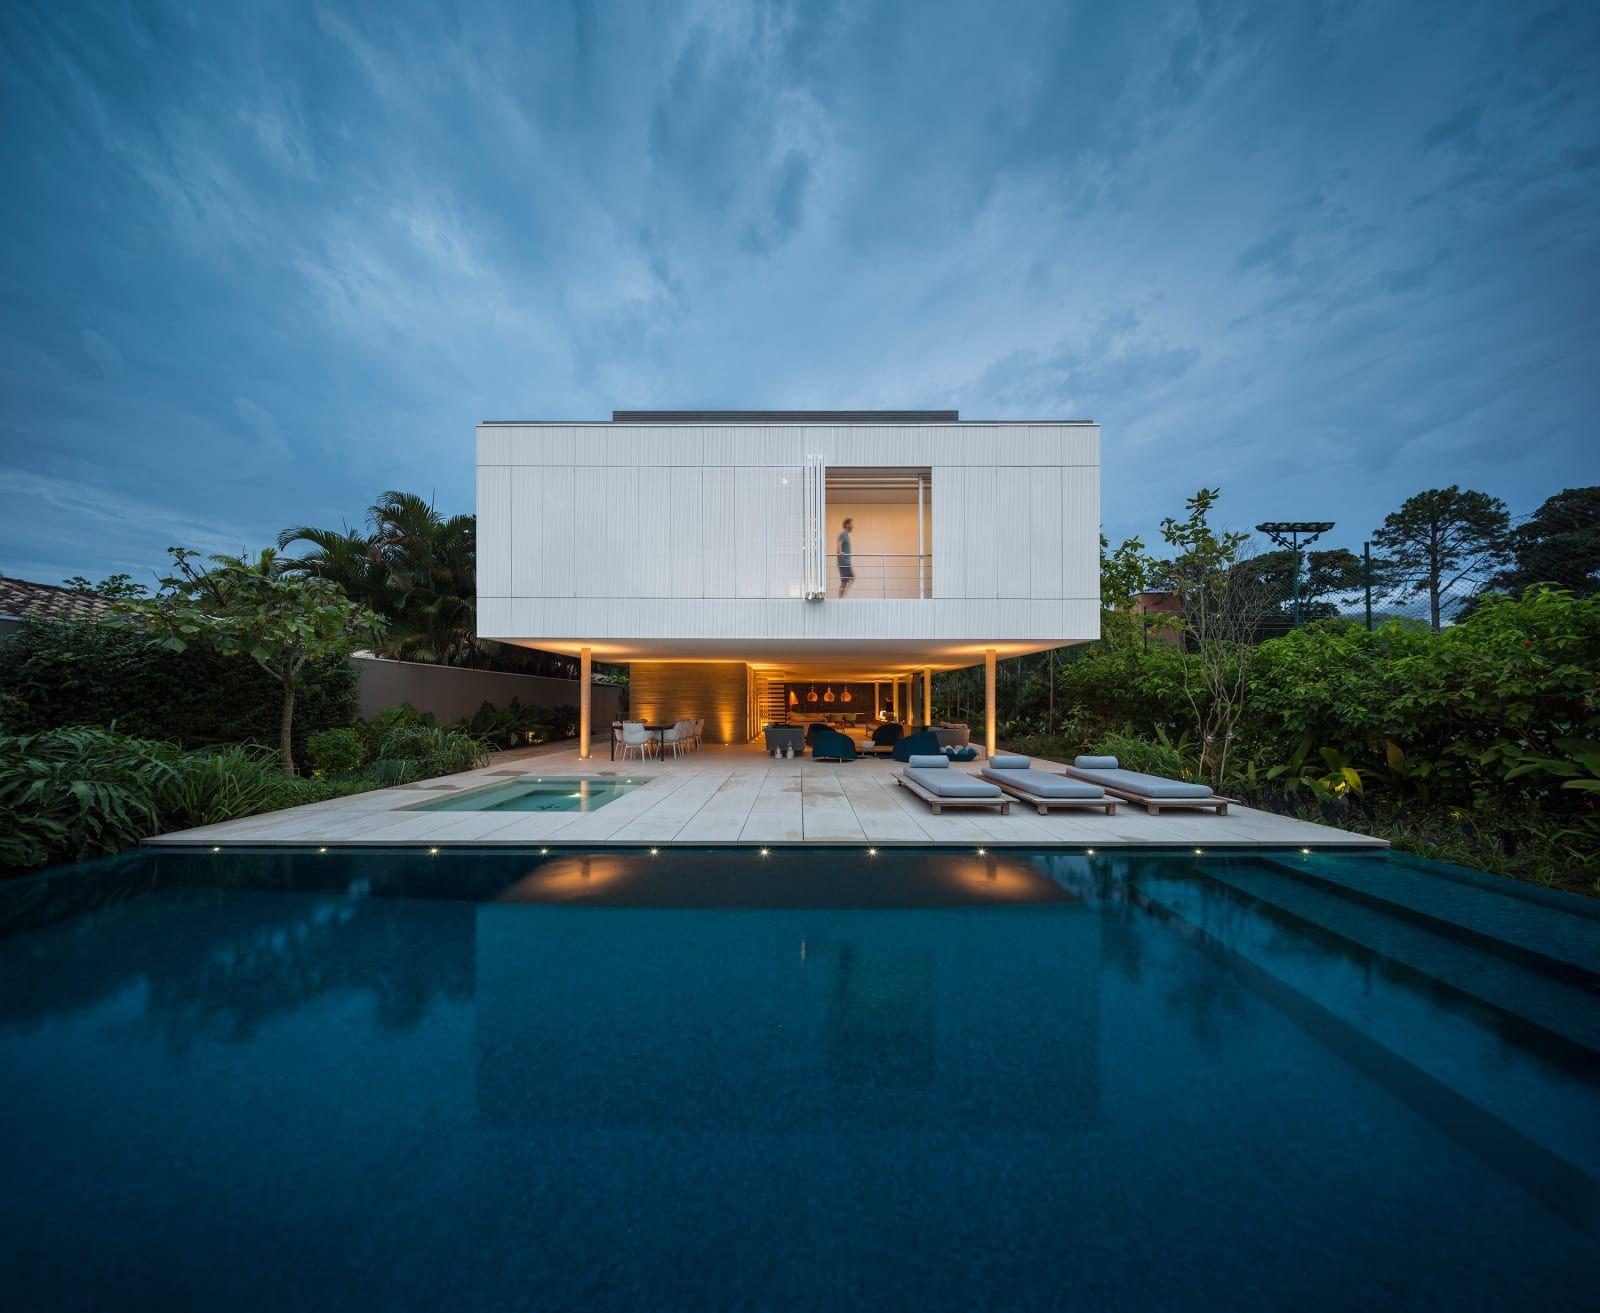 Studio Mk27   Marcio Kogan, Fernando Guerra / FG+SG · White House   Pools    House Design, Minimalist House Design, Modern House Design